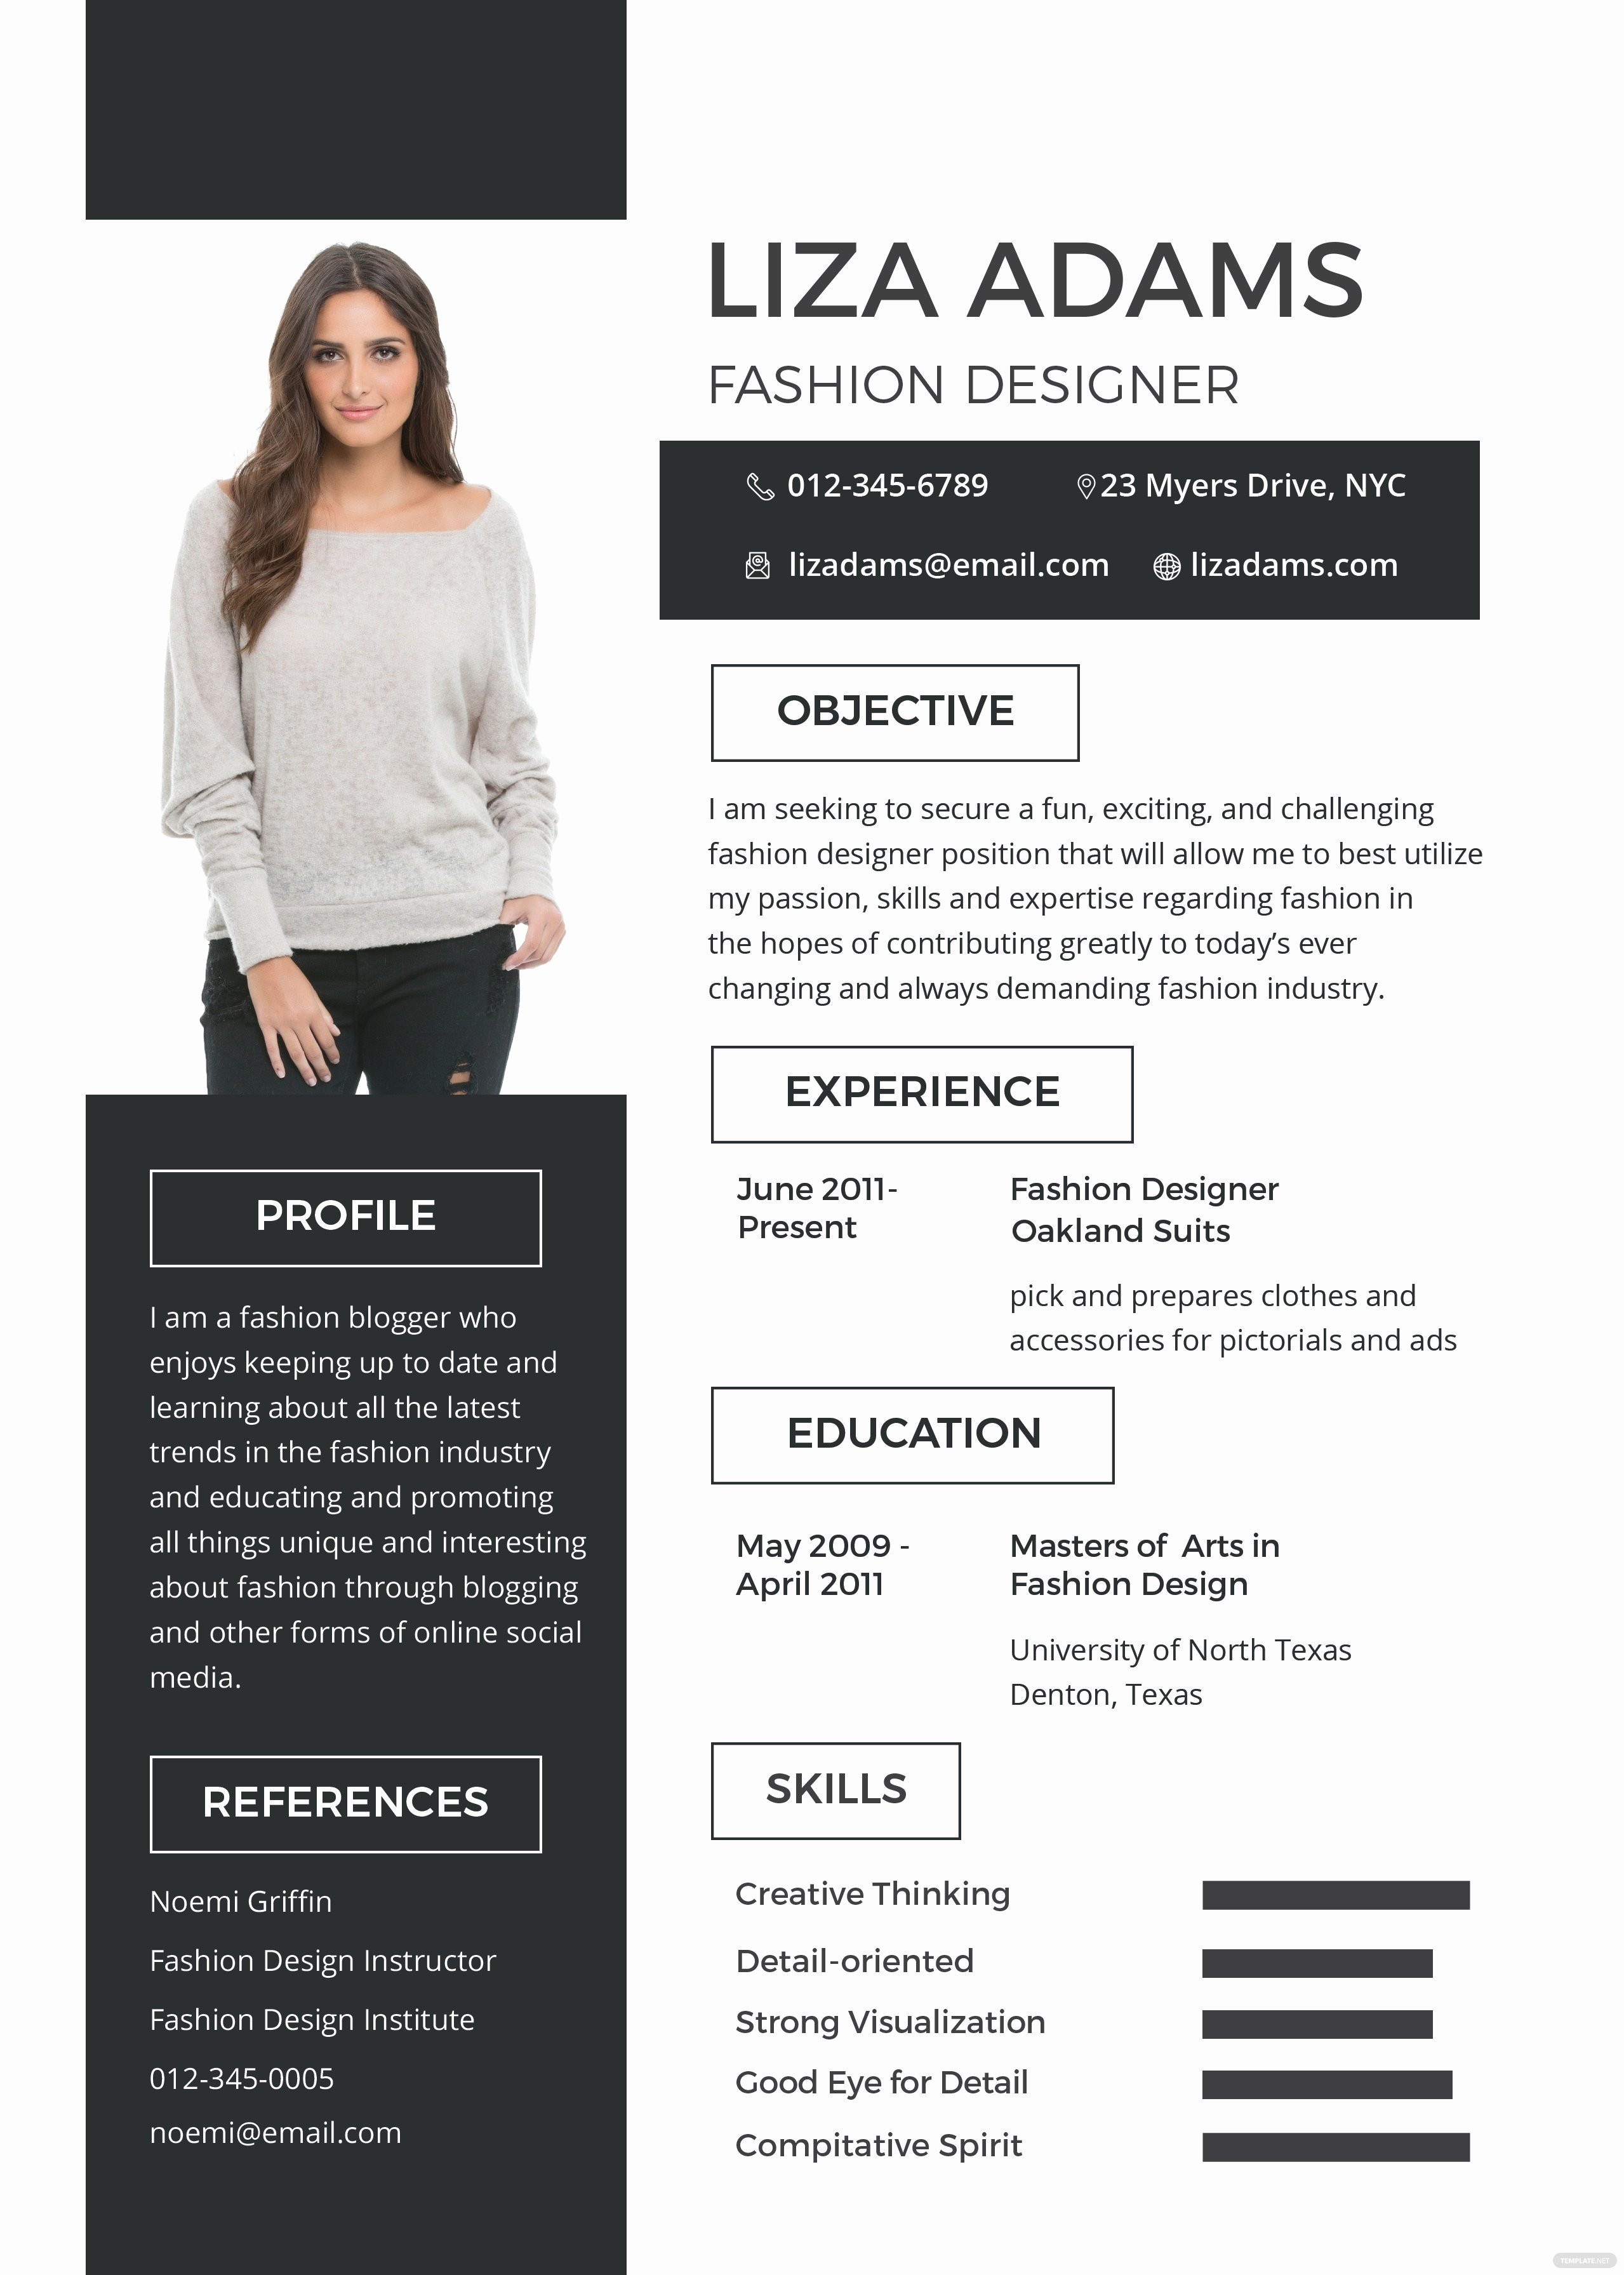 Makeup Artist Bio Samples Inspirational Free Fashion Designer Resume and Cv Template In Psd Ms